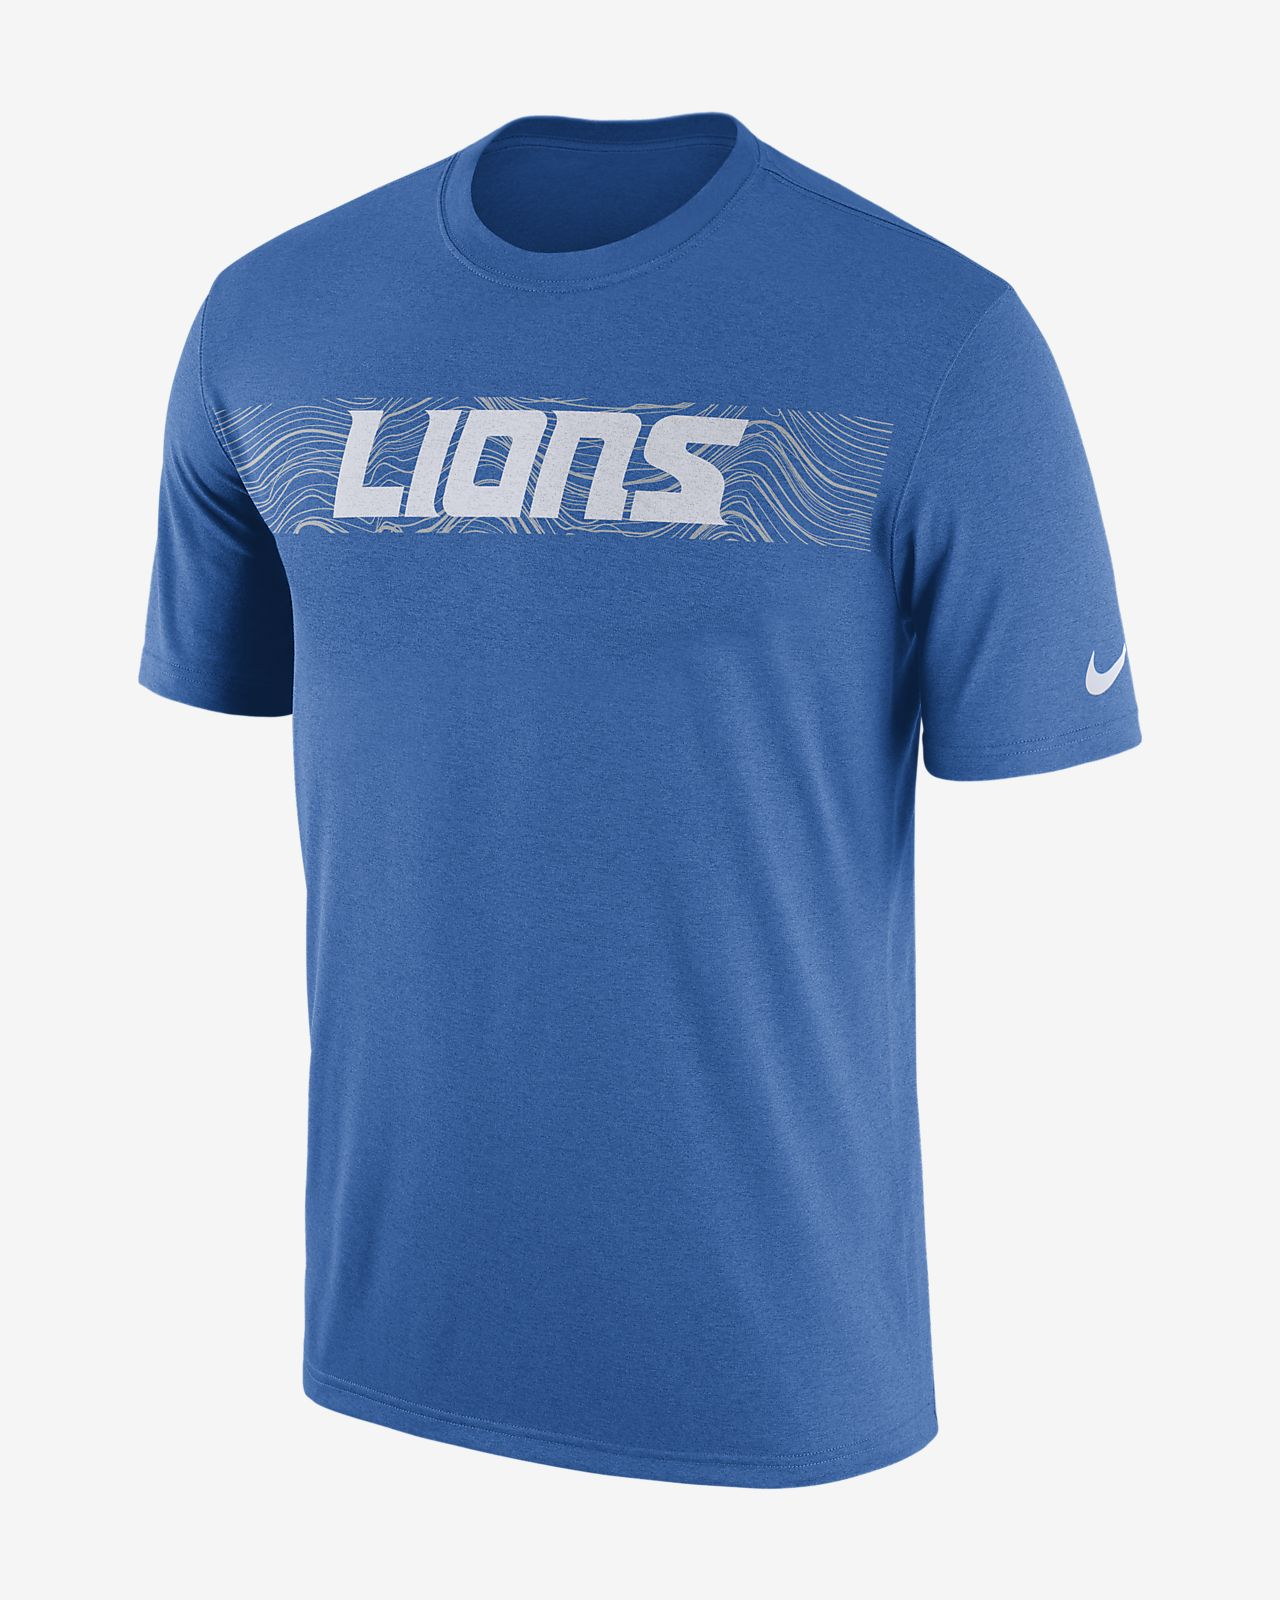 Nike Dri-FIT Legend Seismic (NFL Lions) Men's T-Shirt